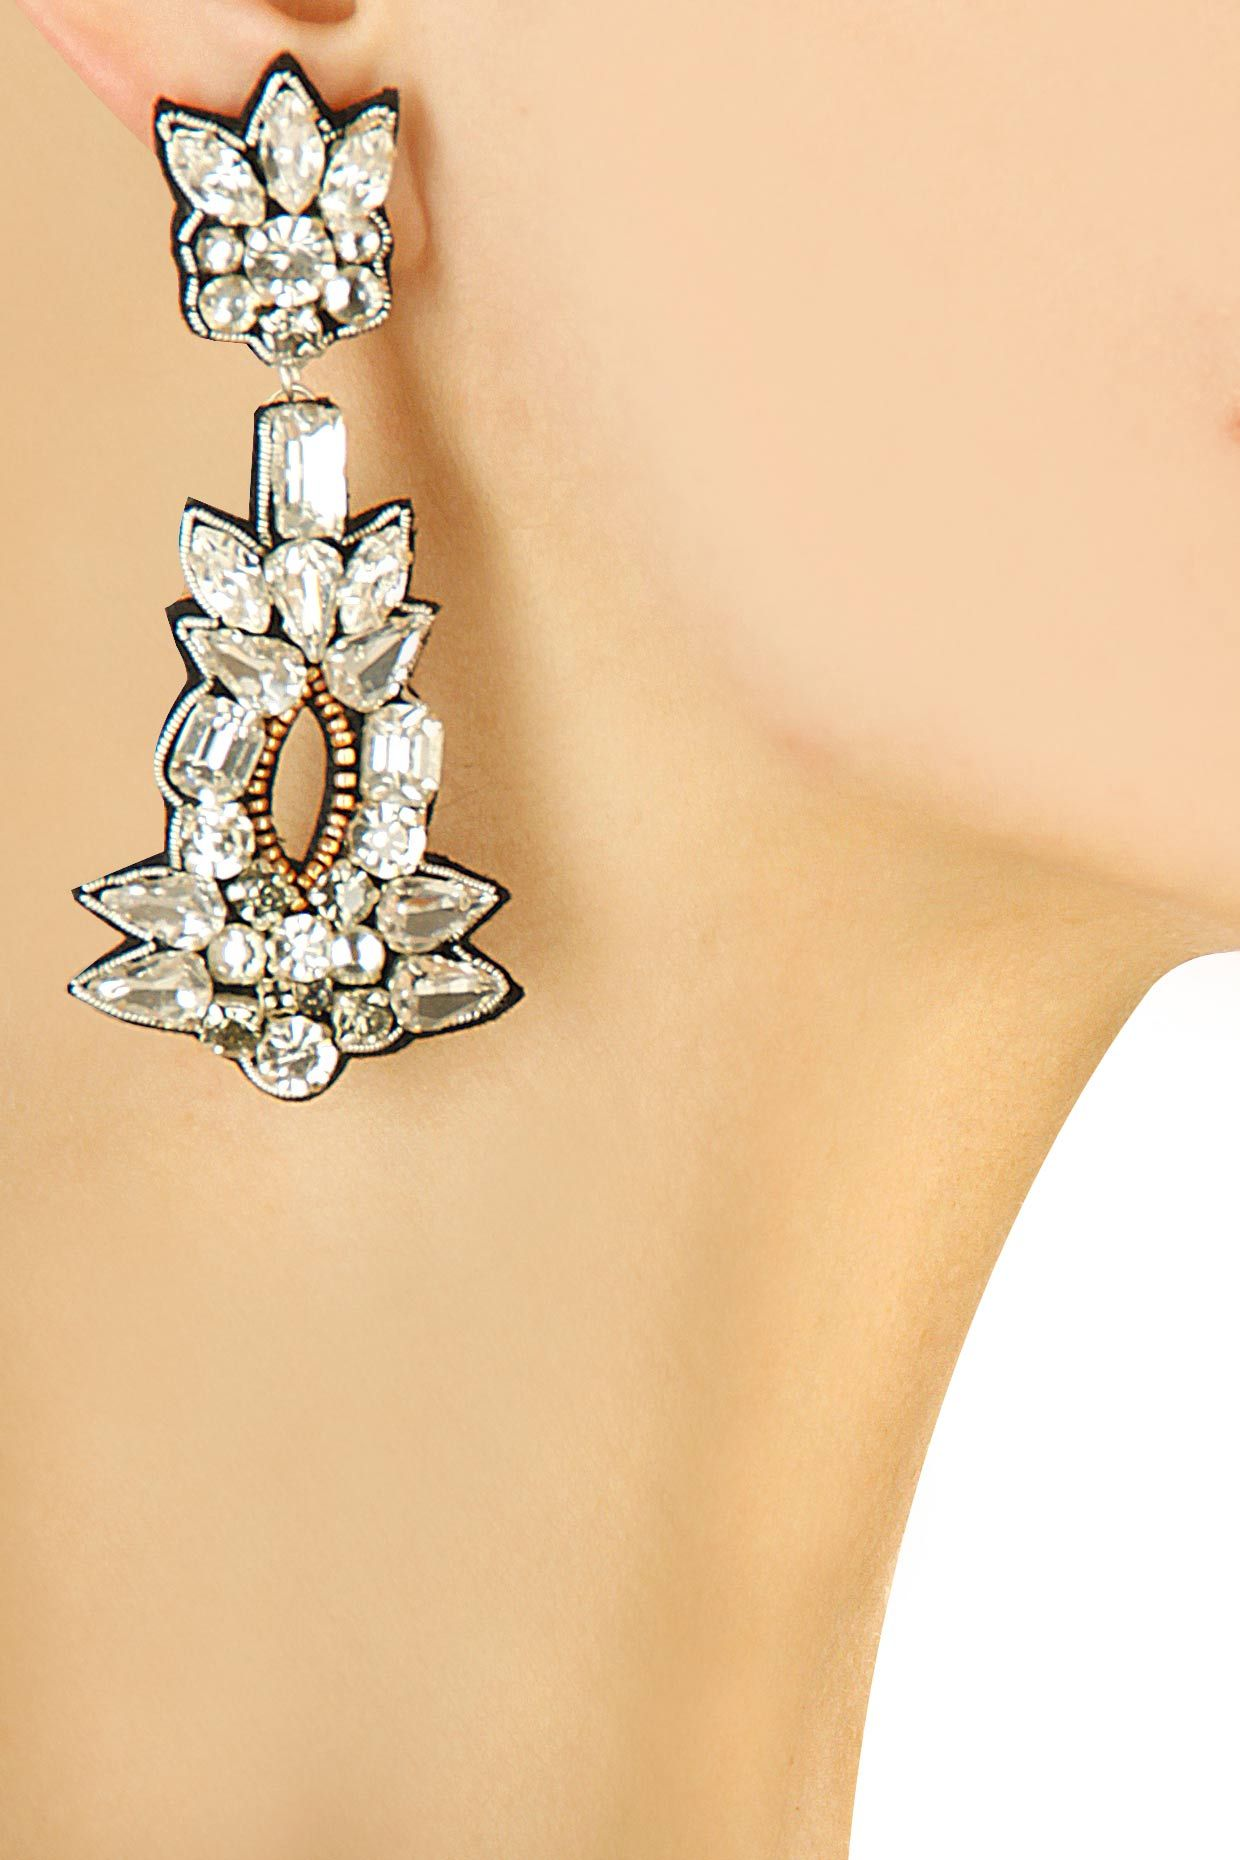 Jane earrings by Preeti Mcconkey. Shop now: http://www.perniaspopupshop.com/designers/preeti-mcconkey #earrings #preetimcconkey #shopnow #perniaspopupshop